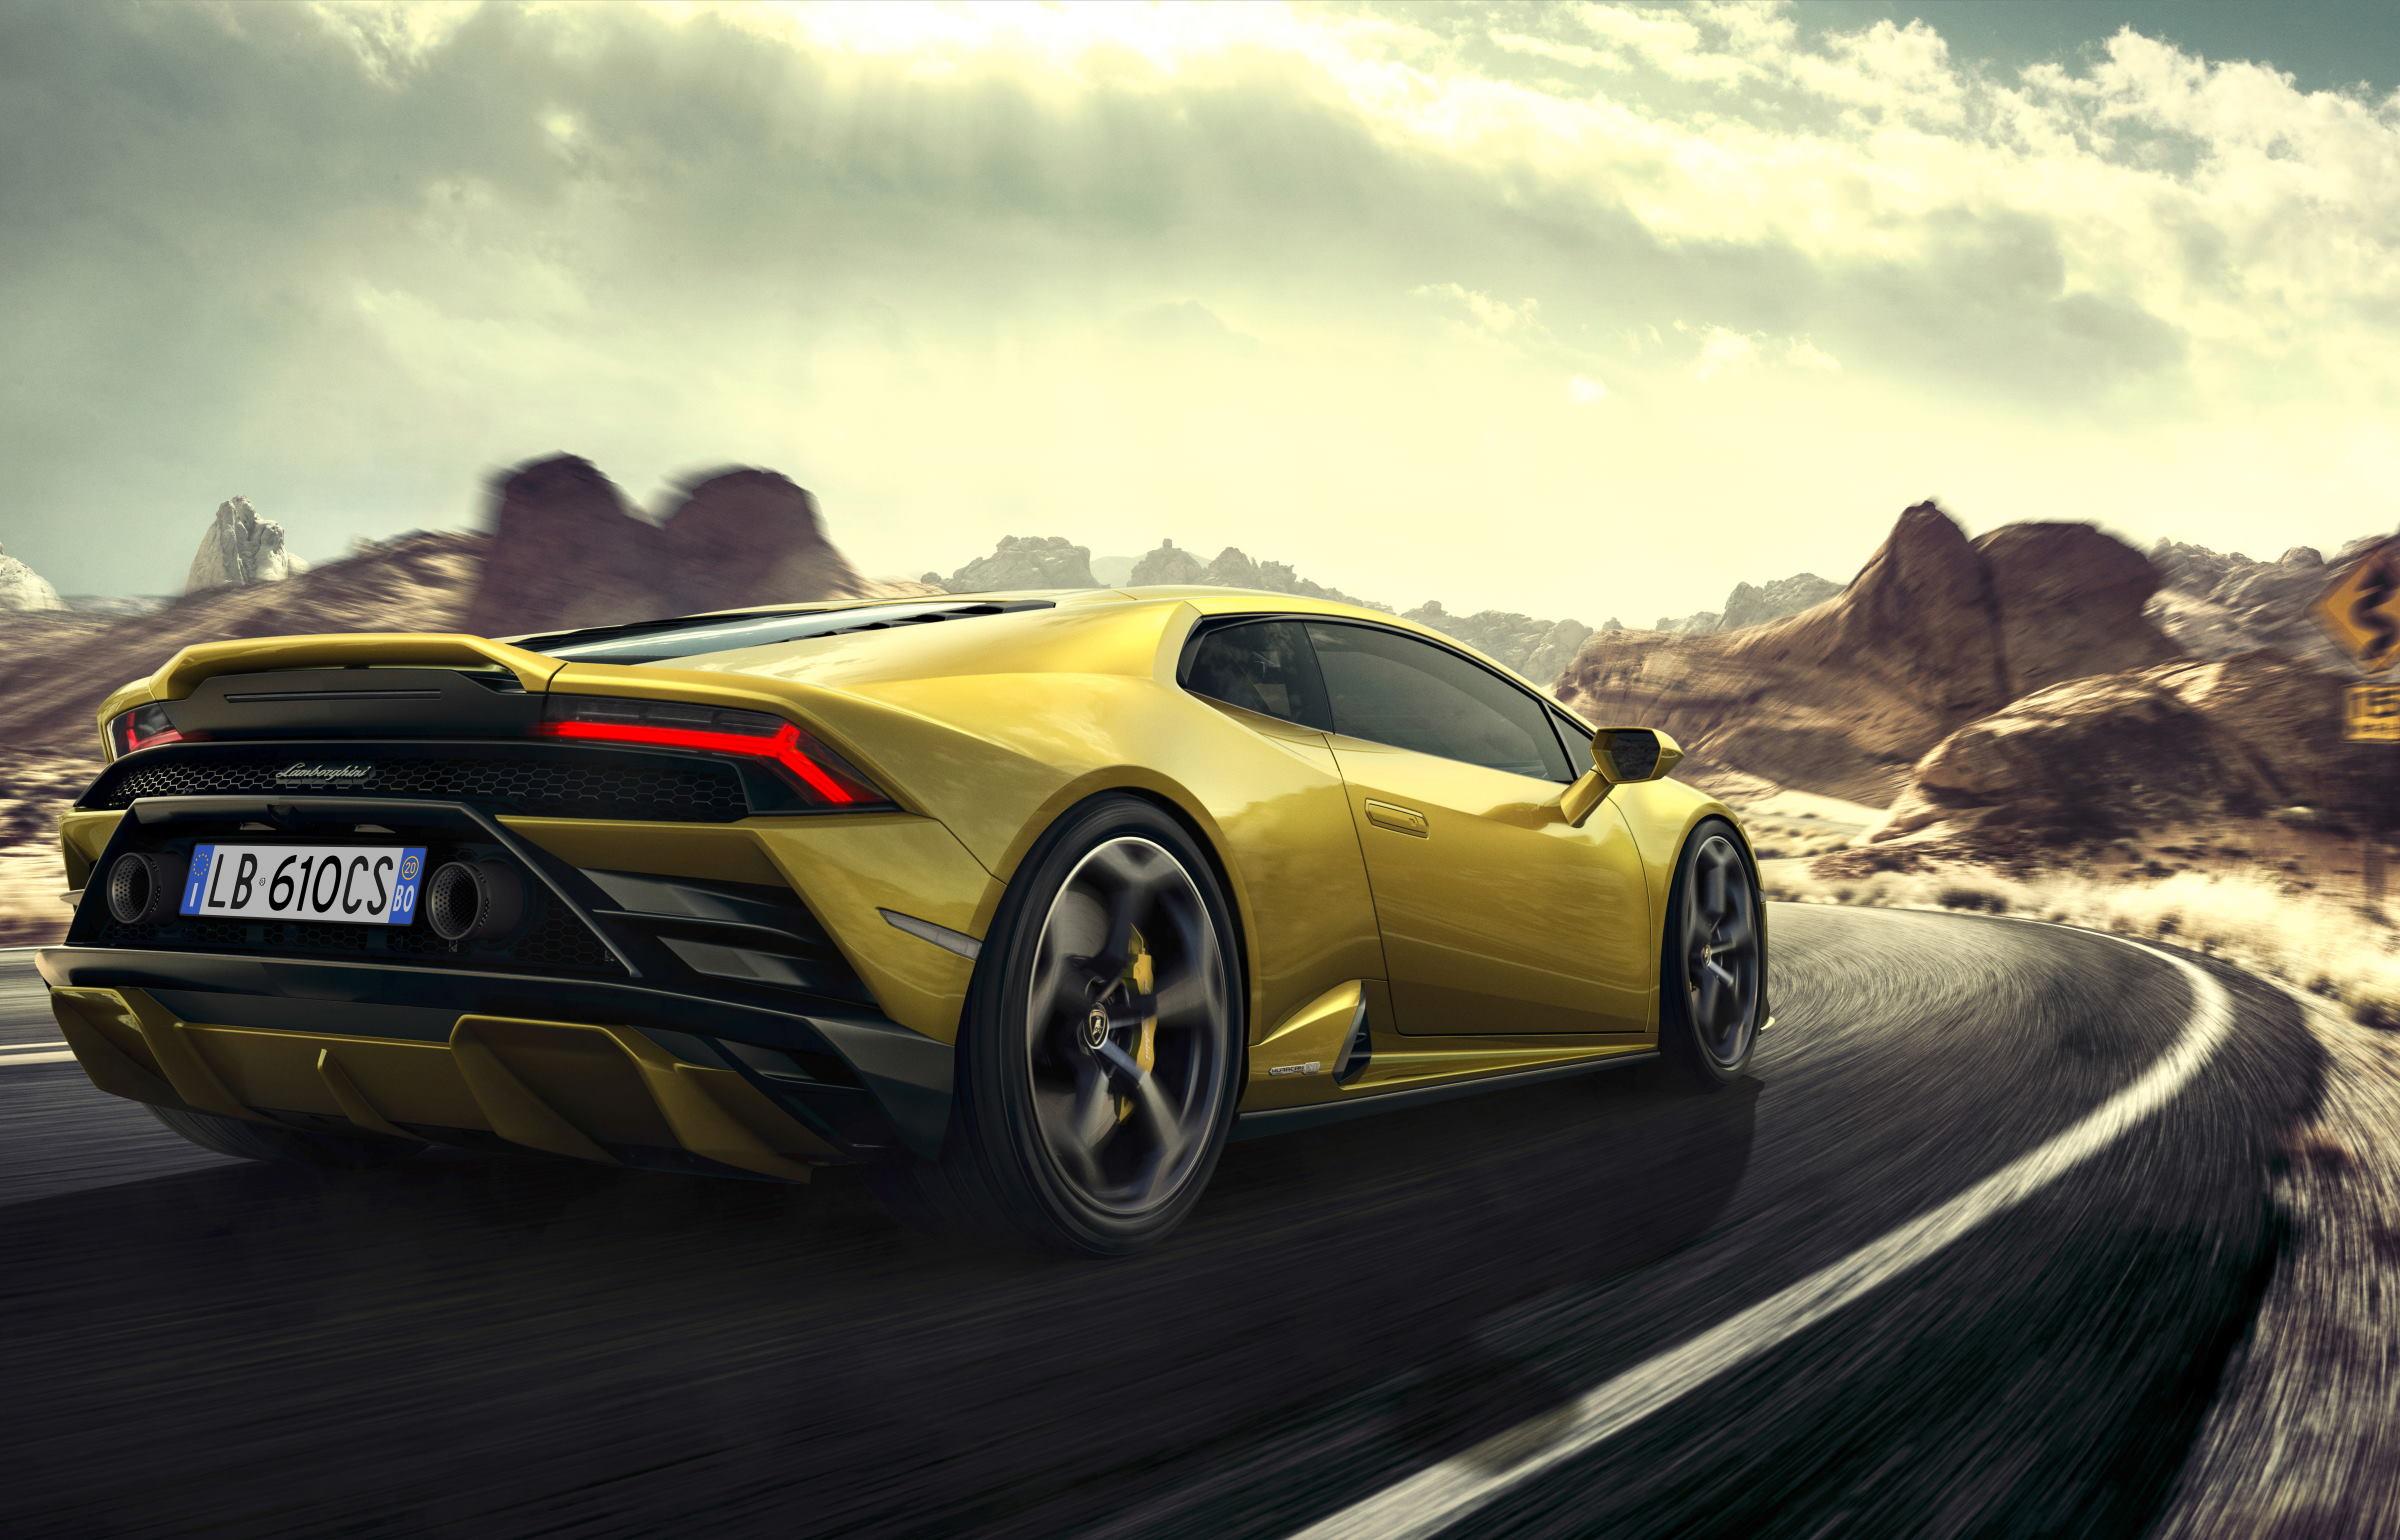 The Car You Pilot: Lamborghini Huracán Evo RWD